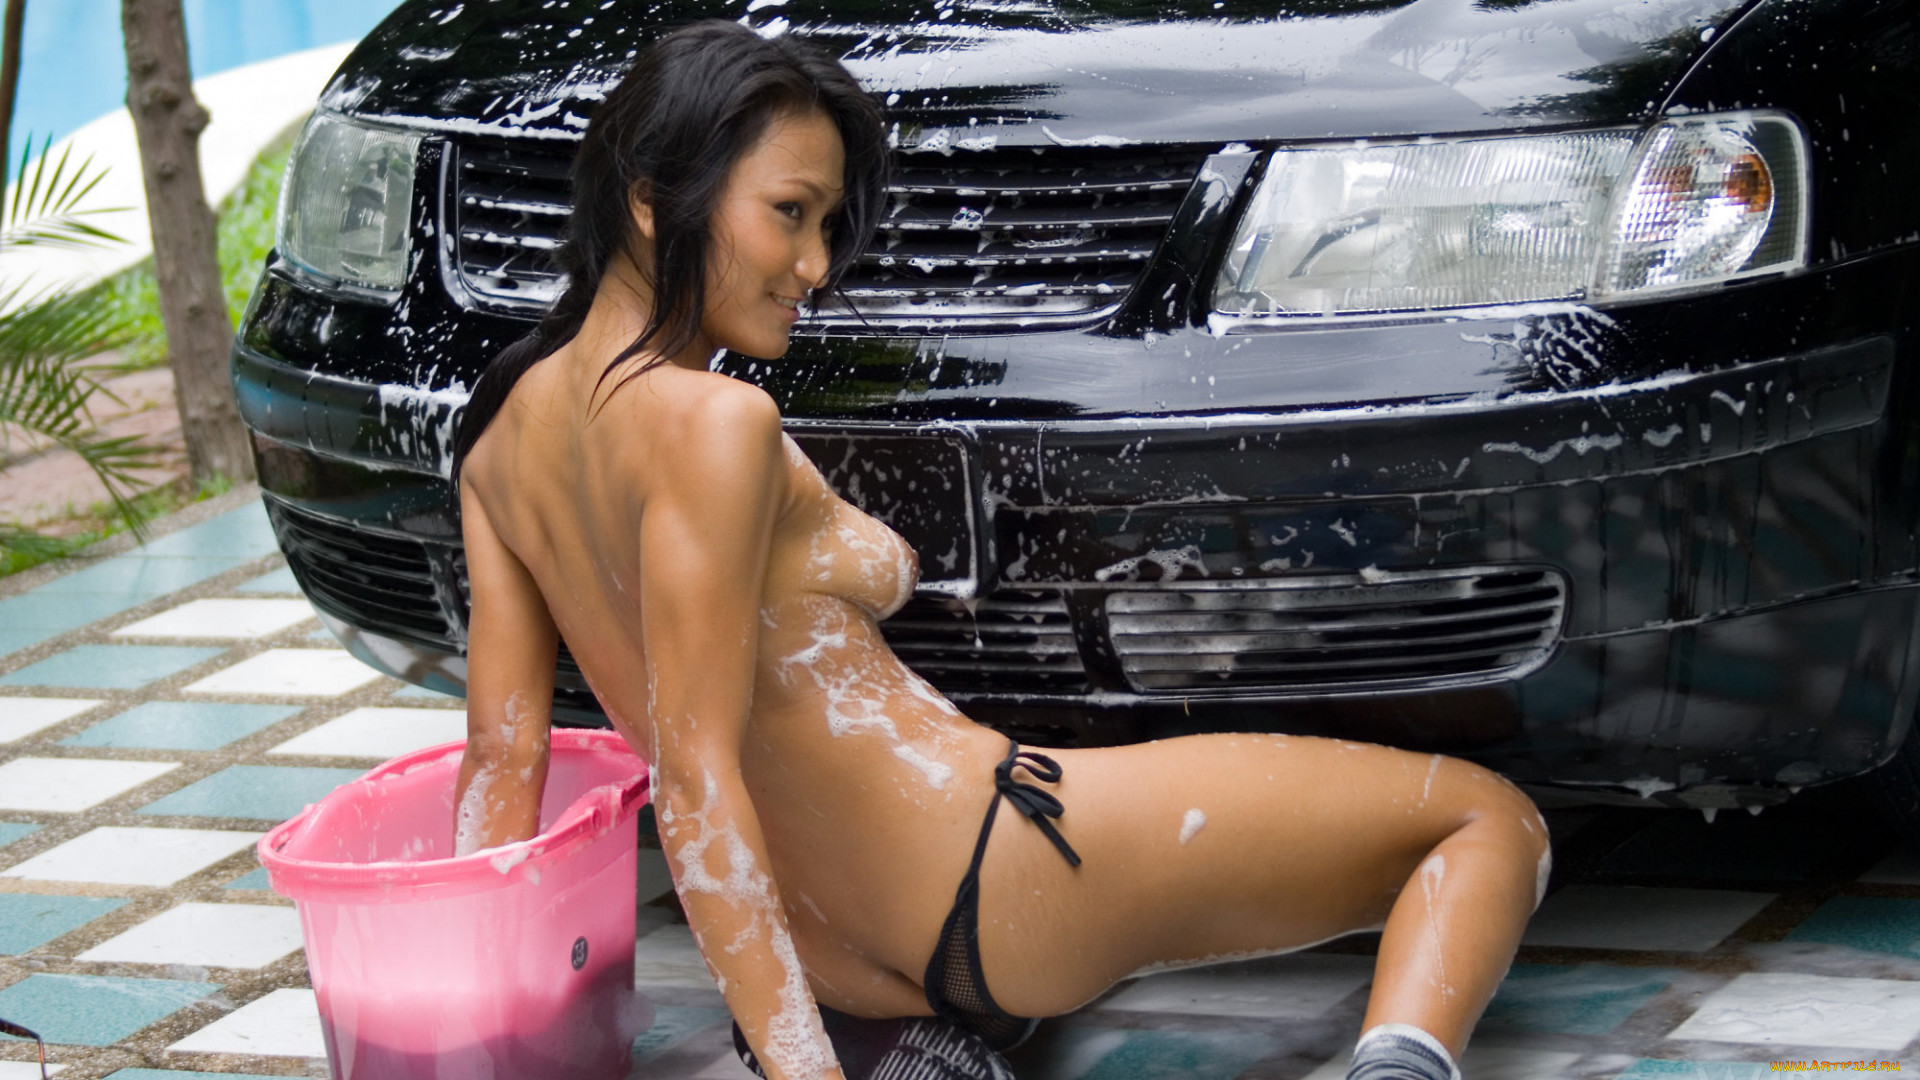 Фото девушки машины эротика